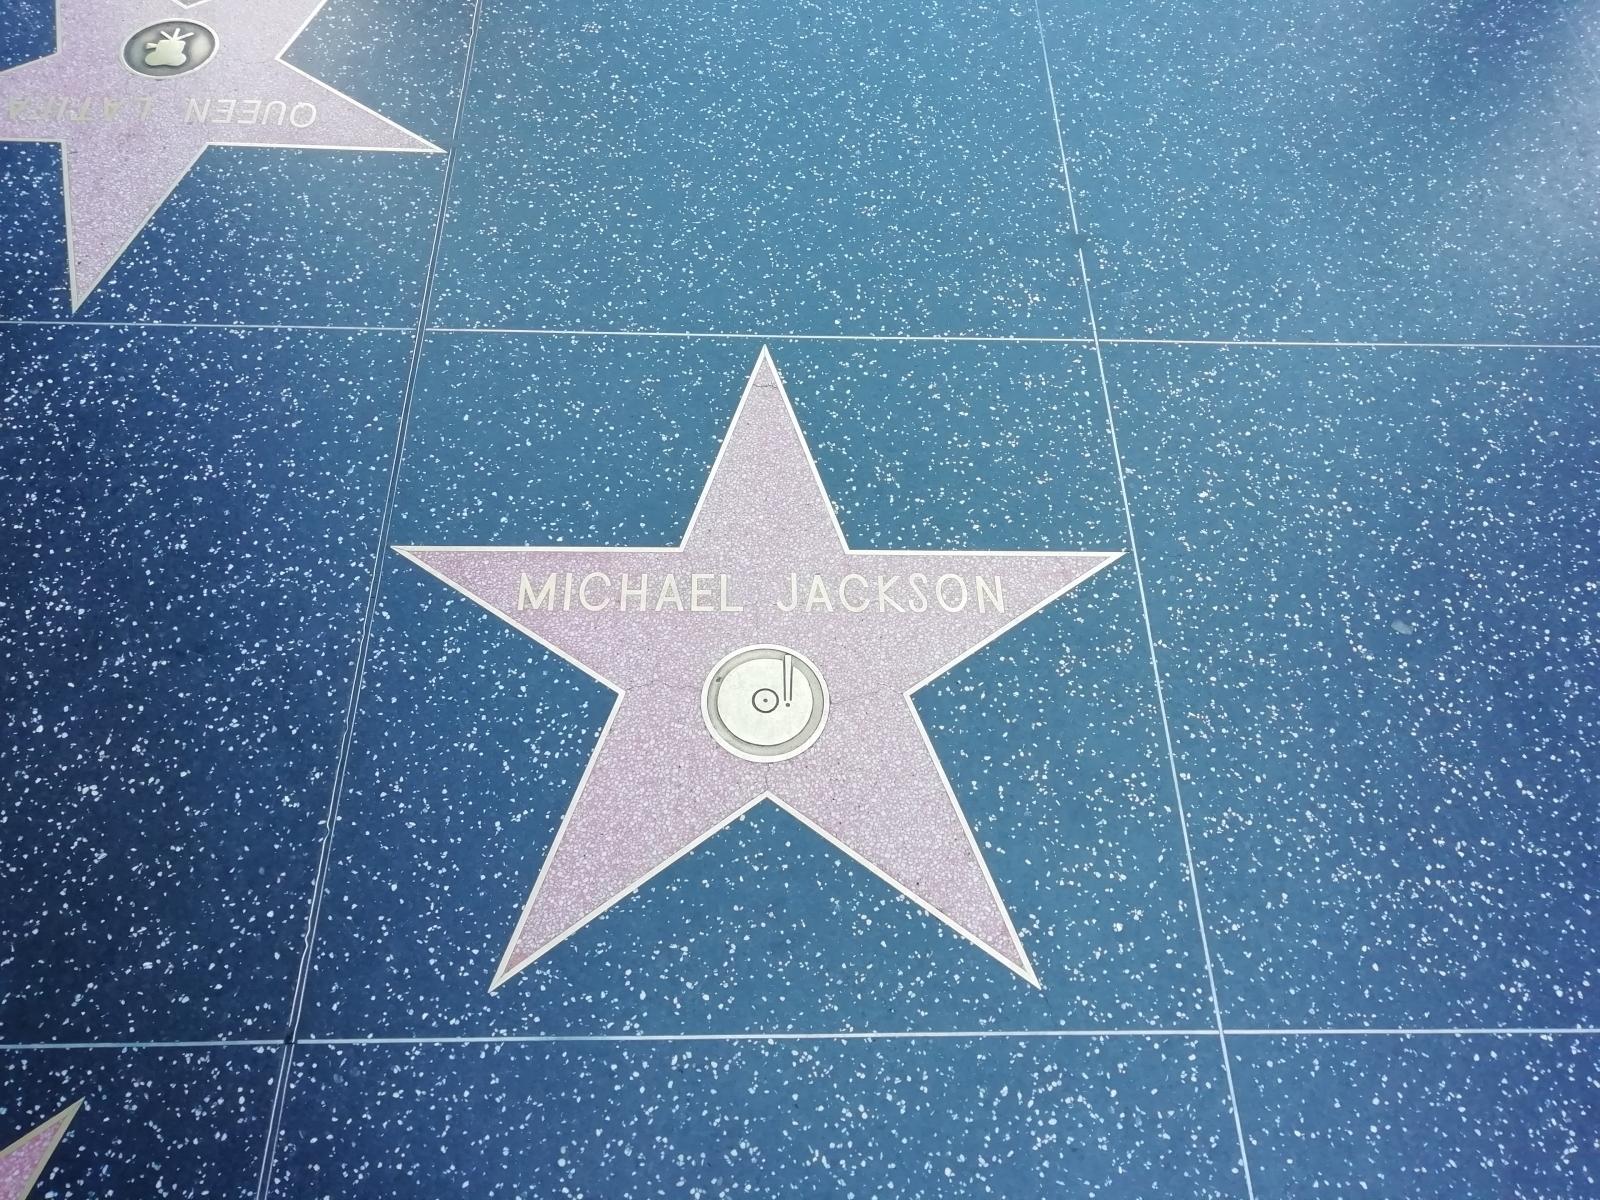 Звезда Майкла Джексона